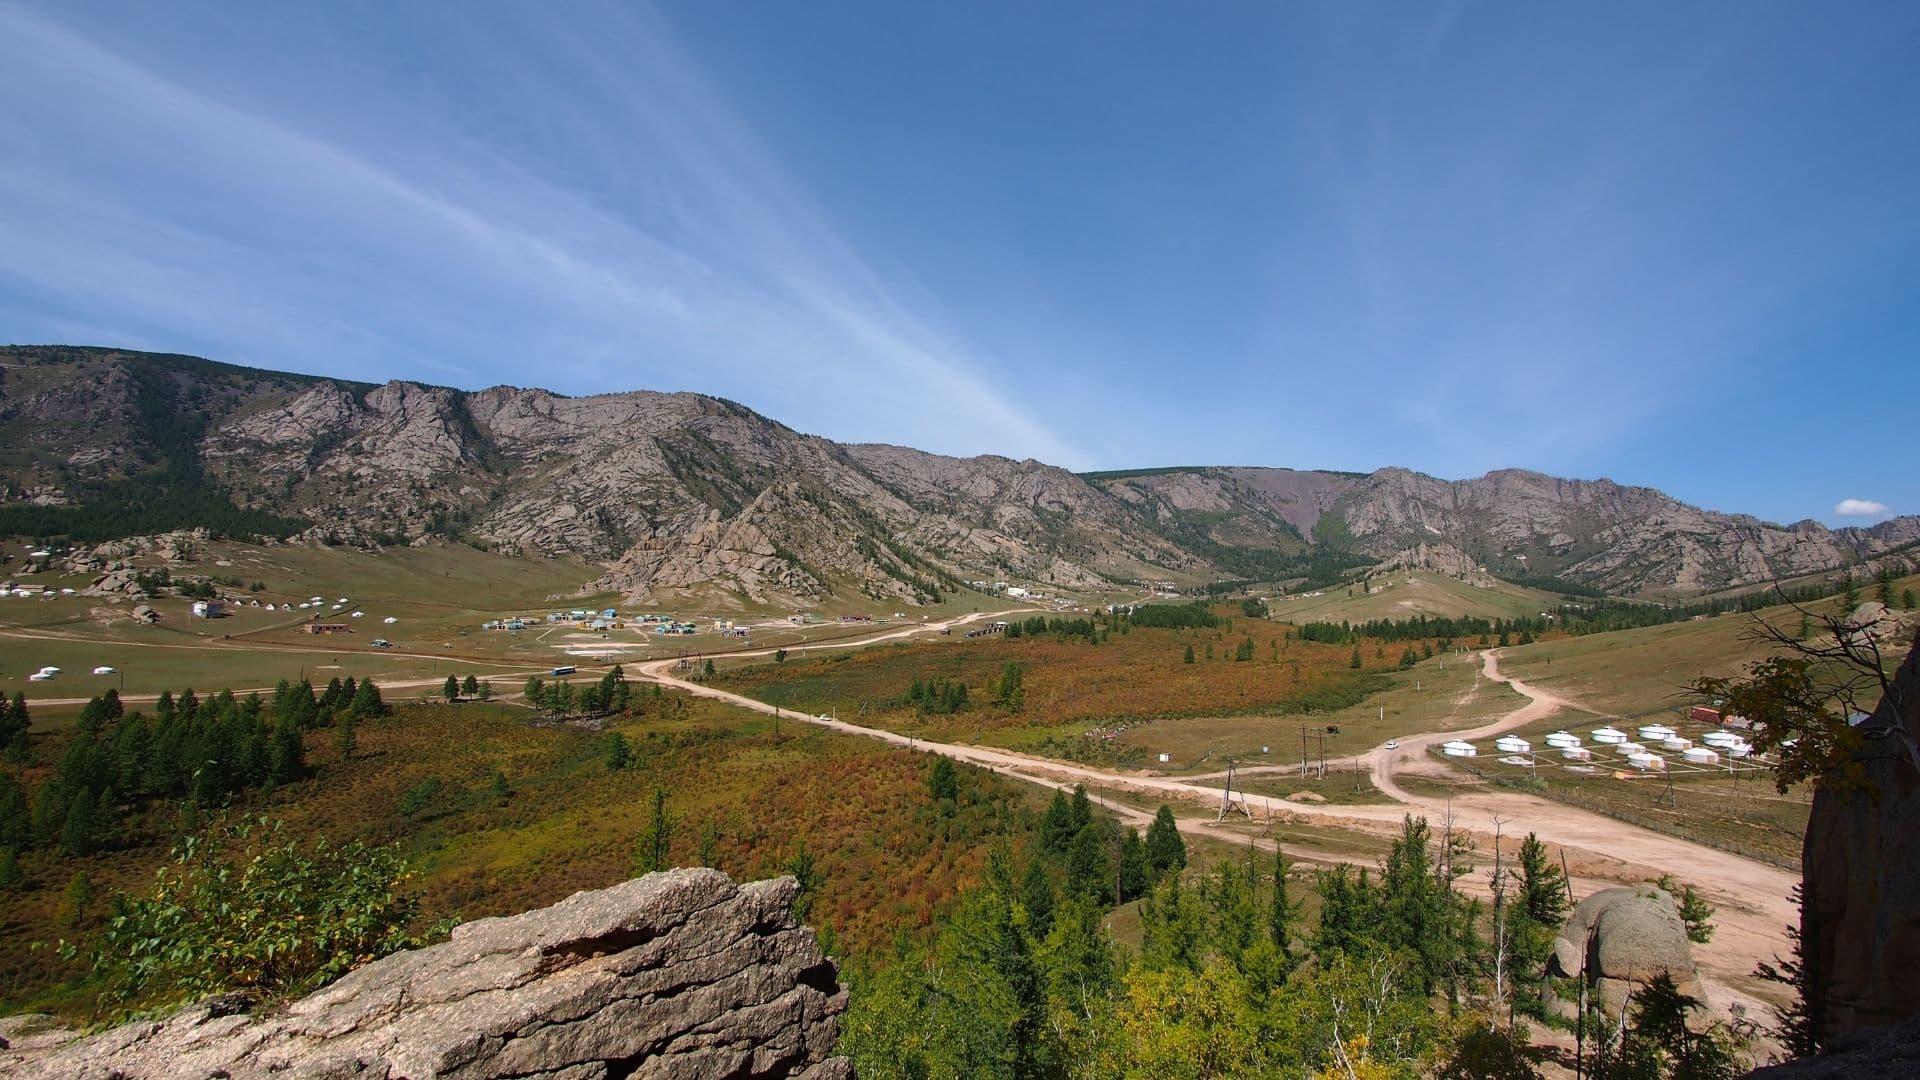 Parque Nacional de Terelj en Mongolia